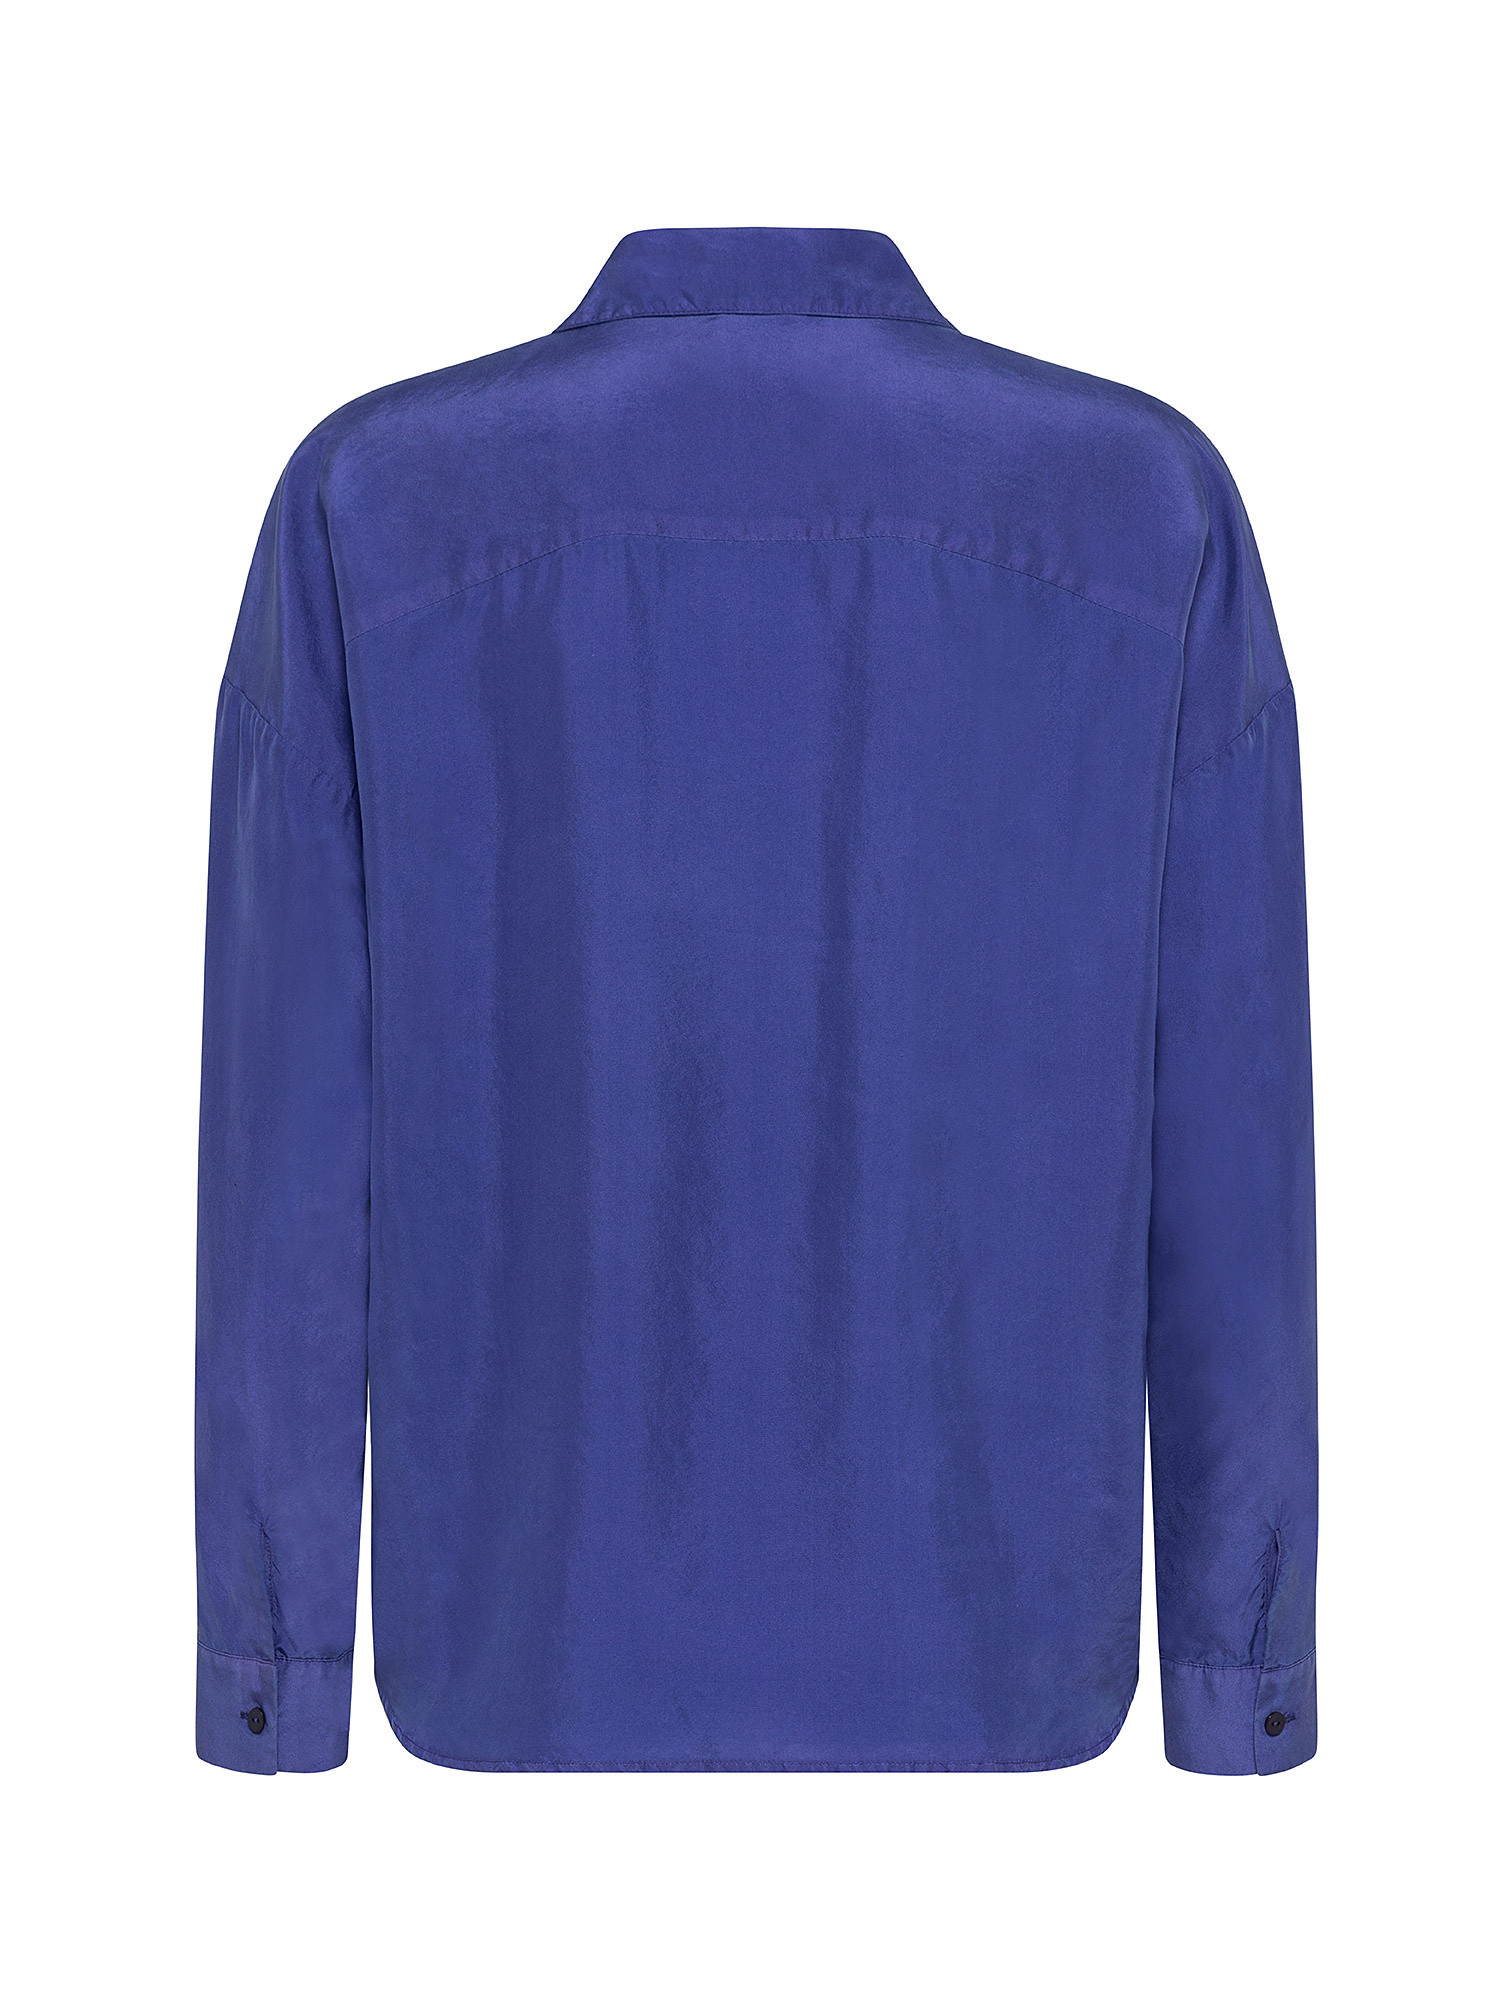 Camicia donna in seta, Azzurro Oceano, large image number 1